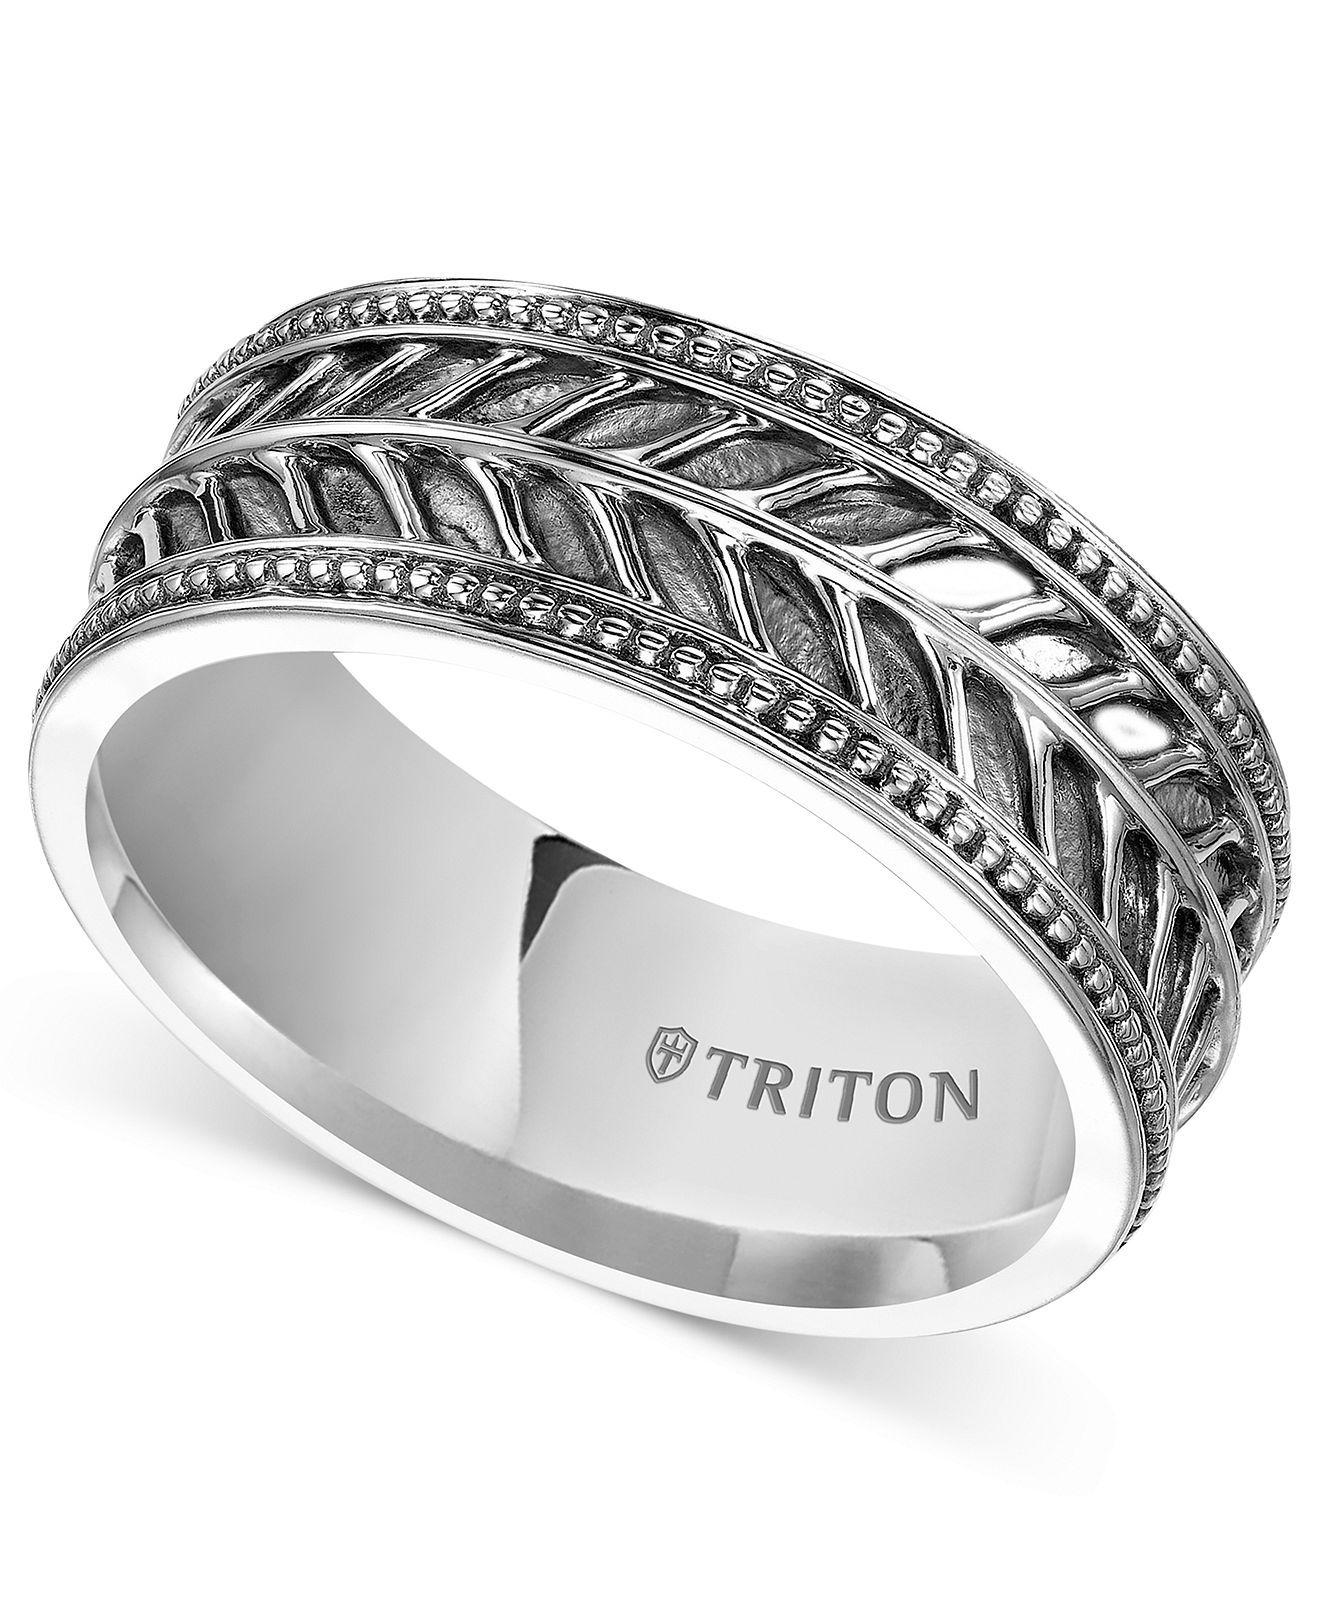 Triton Men's Sterling Silver Ring, 10mm Leaf Pattern